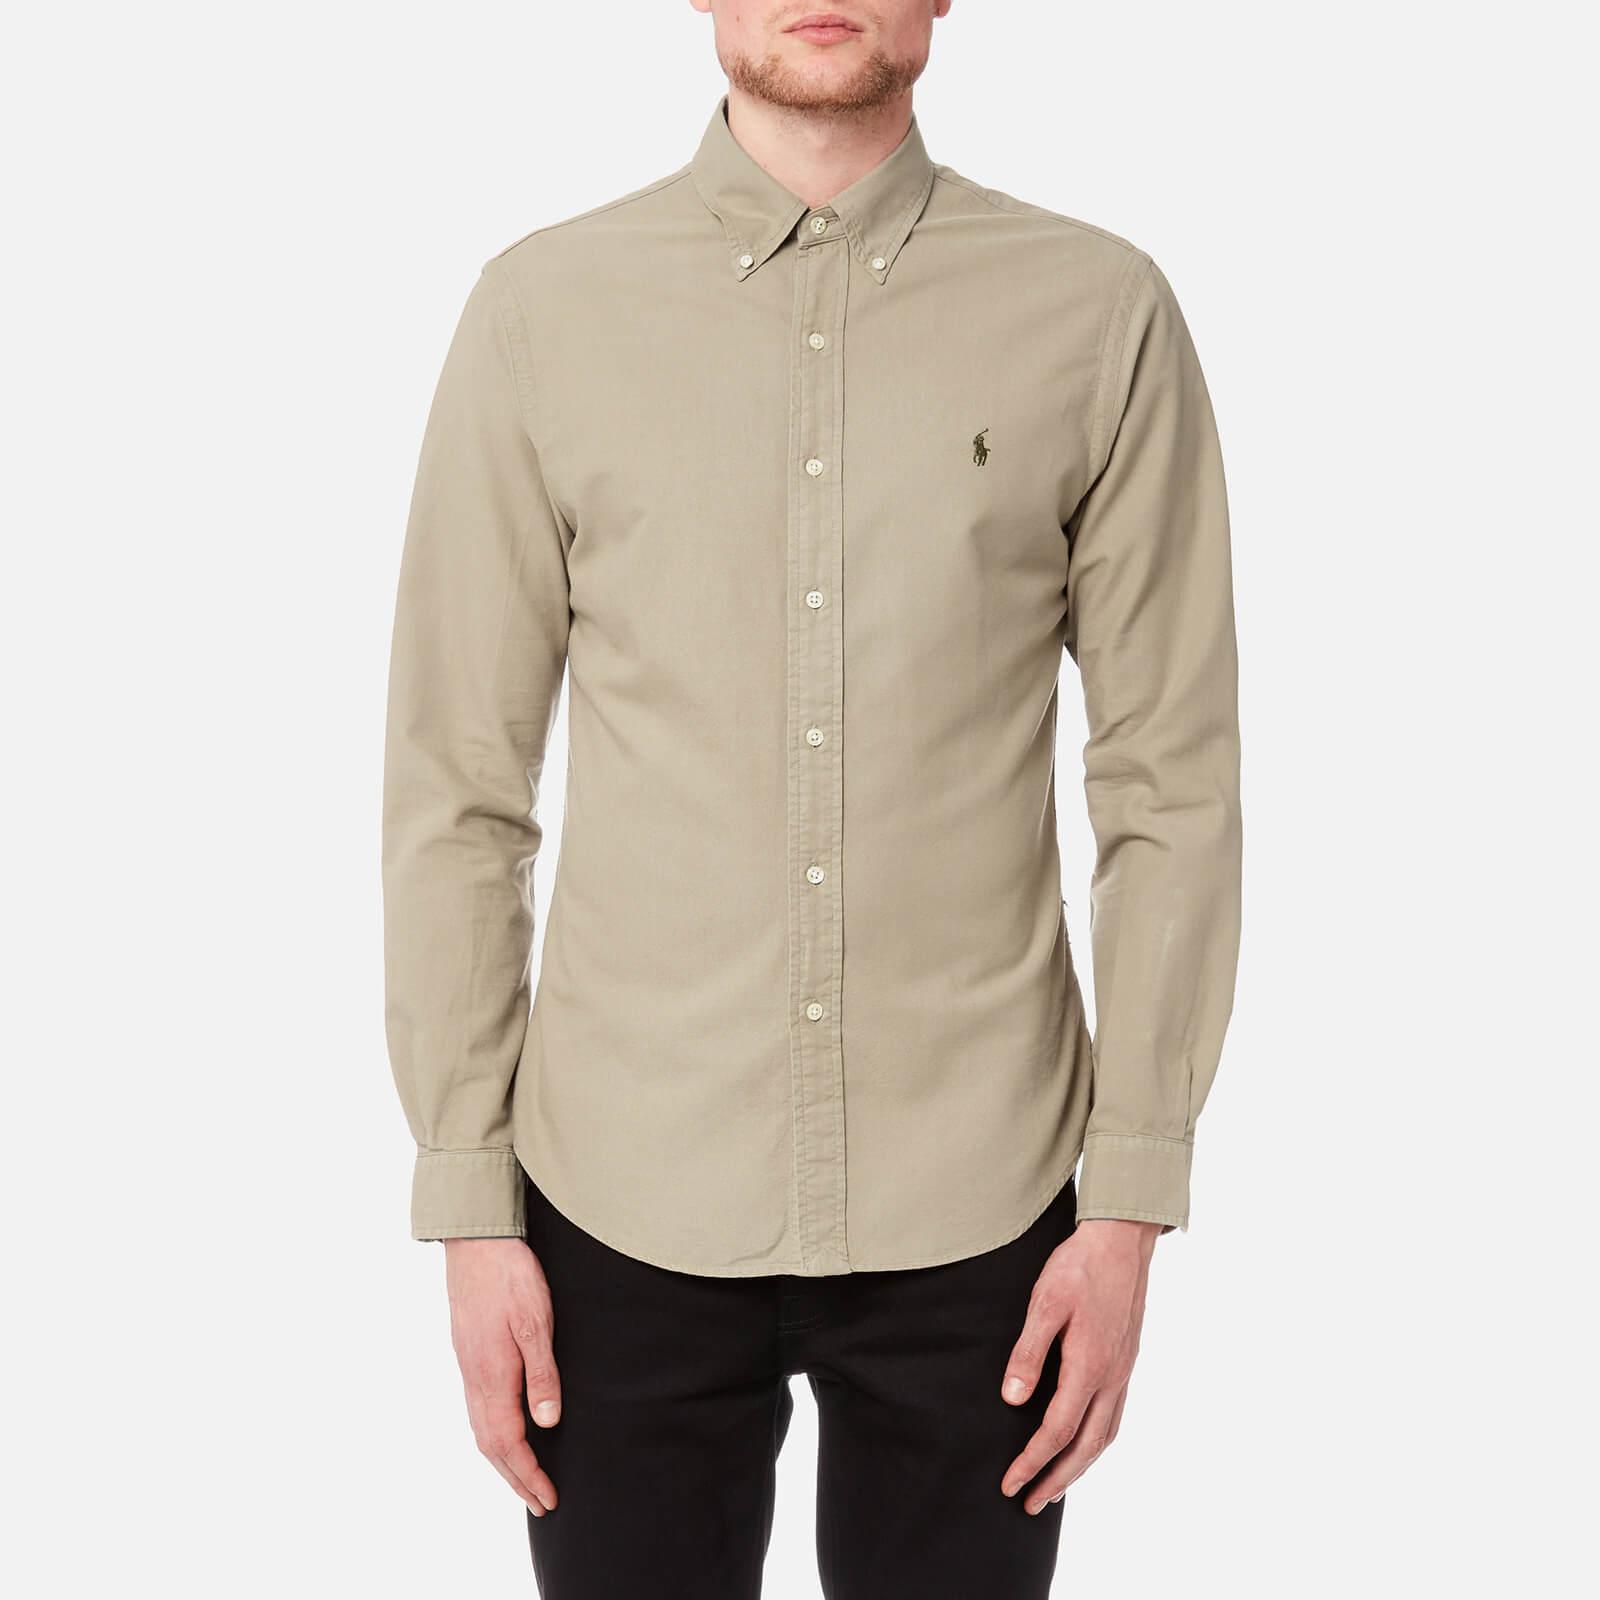 c157d612d12 Polo Ralph Lauren Men s Slim Fit Garment Dye Shirt - Tan - Free UK Delivery  over £50